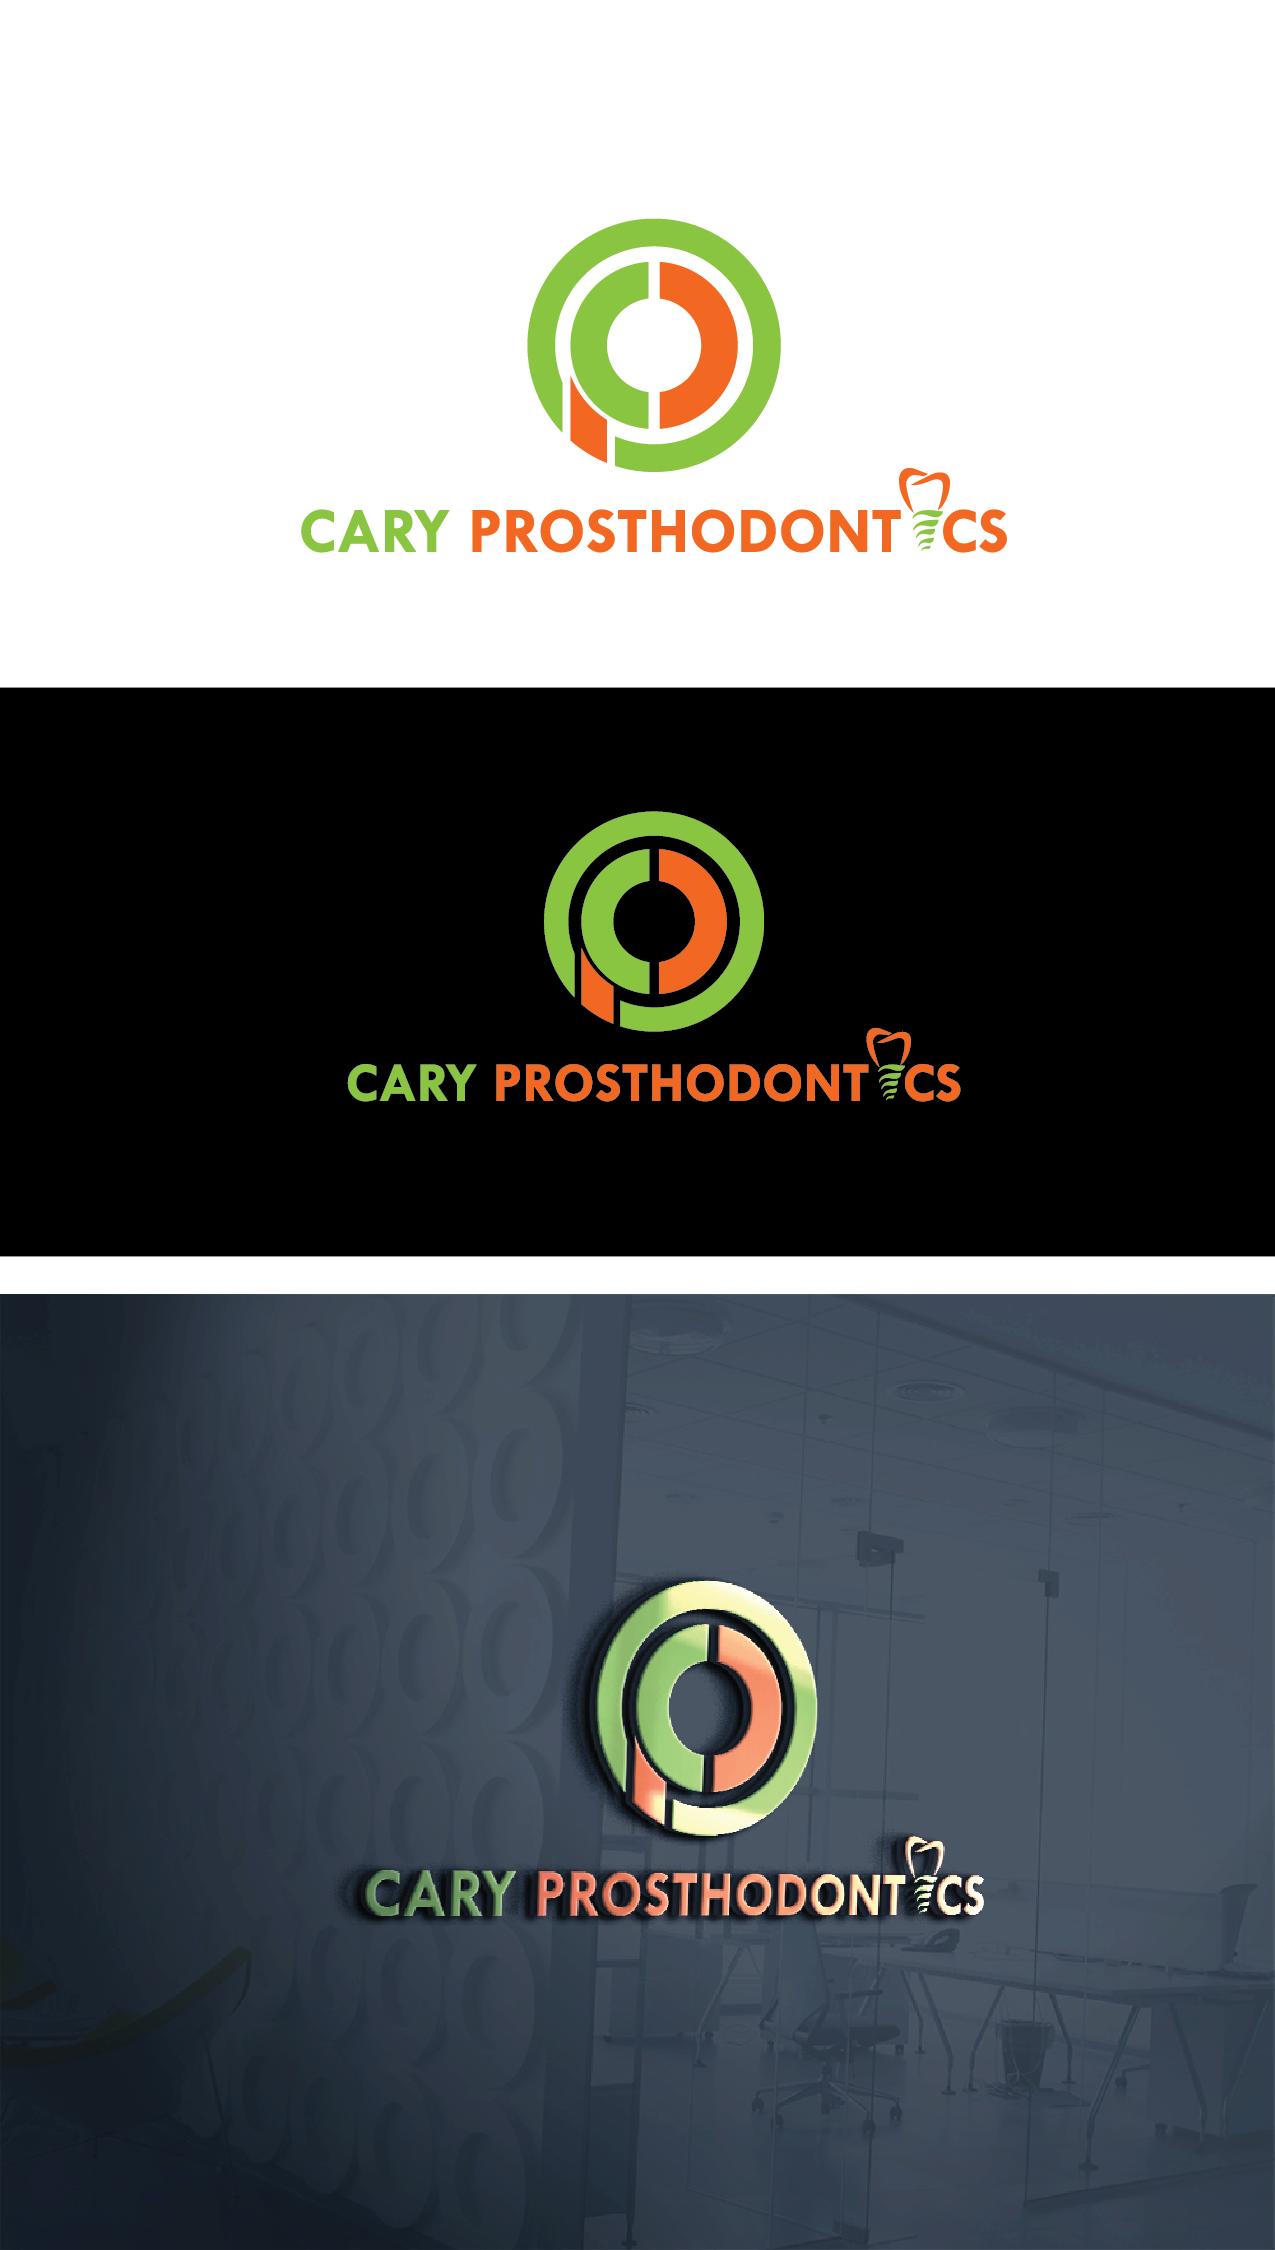 Logo Design by Private User - Entry No. 92 in the Logo Design Contest Cary Prosthodontics Logo Design.